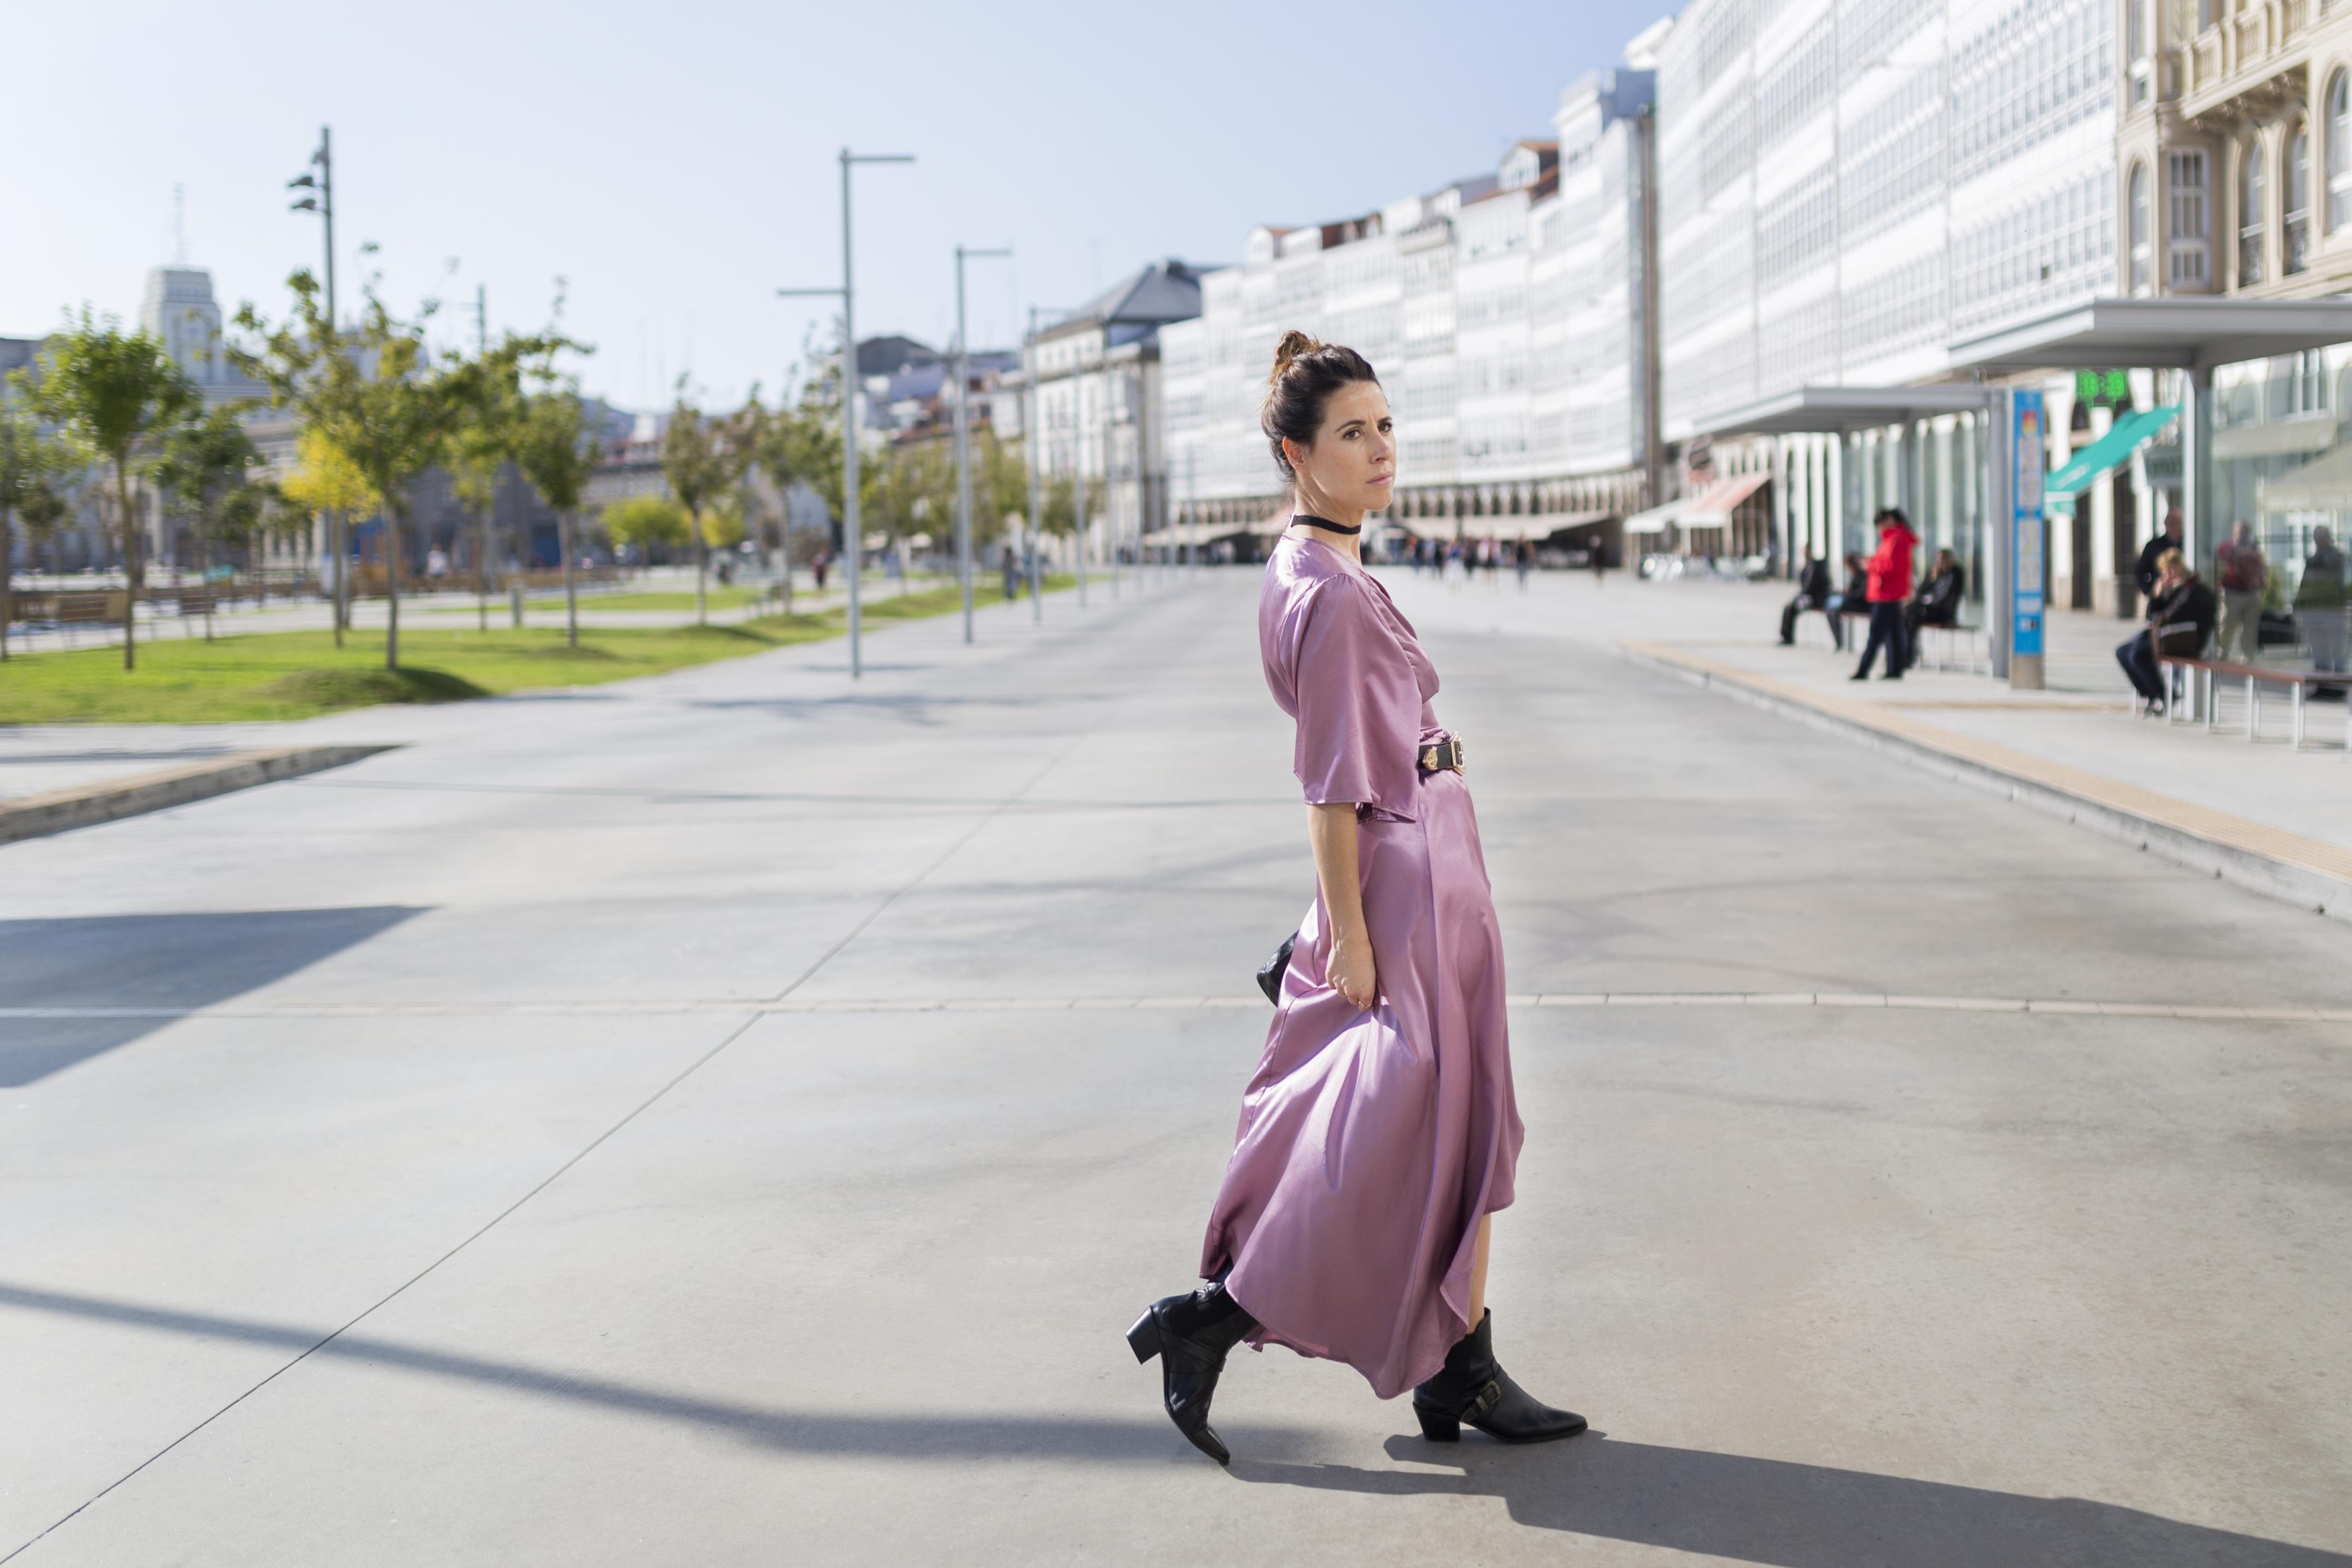 alba cuesta-StyleLovely-blogger- vestido satinado - descalzaporelparque-choker zara - SHEIN - ootd - galicia - fashion -blogger - style - moda calle - streetstyle - denia priegue - video - Shein dress - chanel - vintage - botines - zara